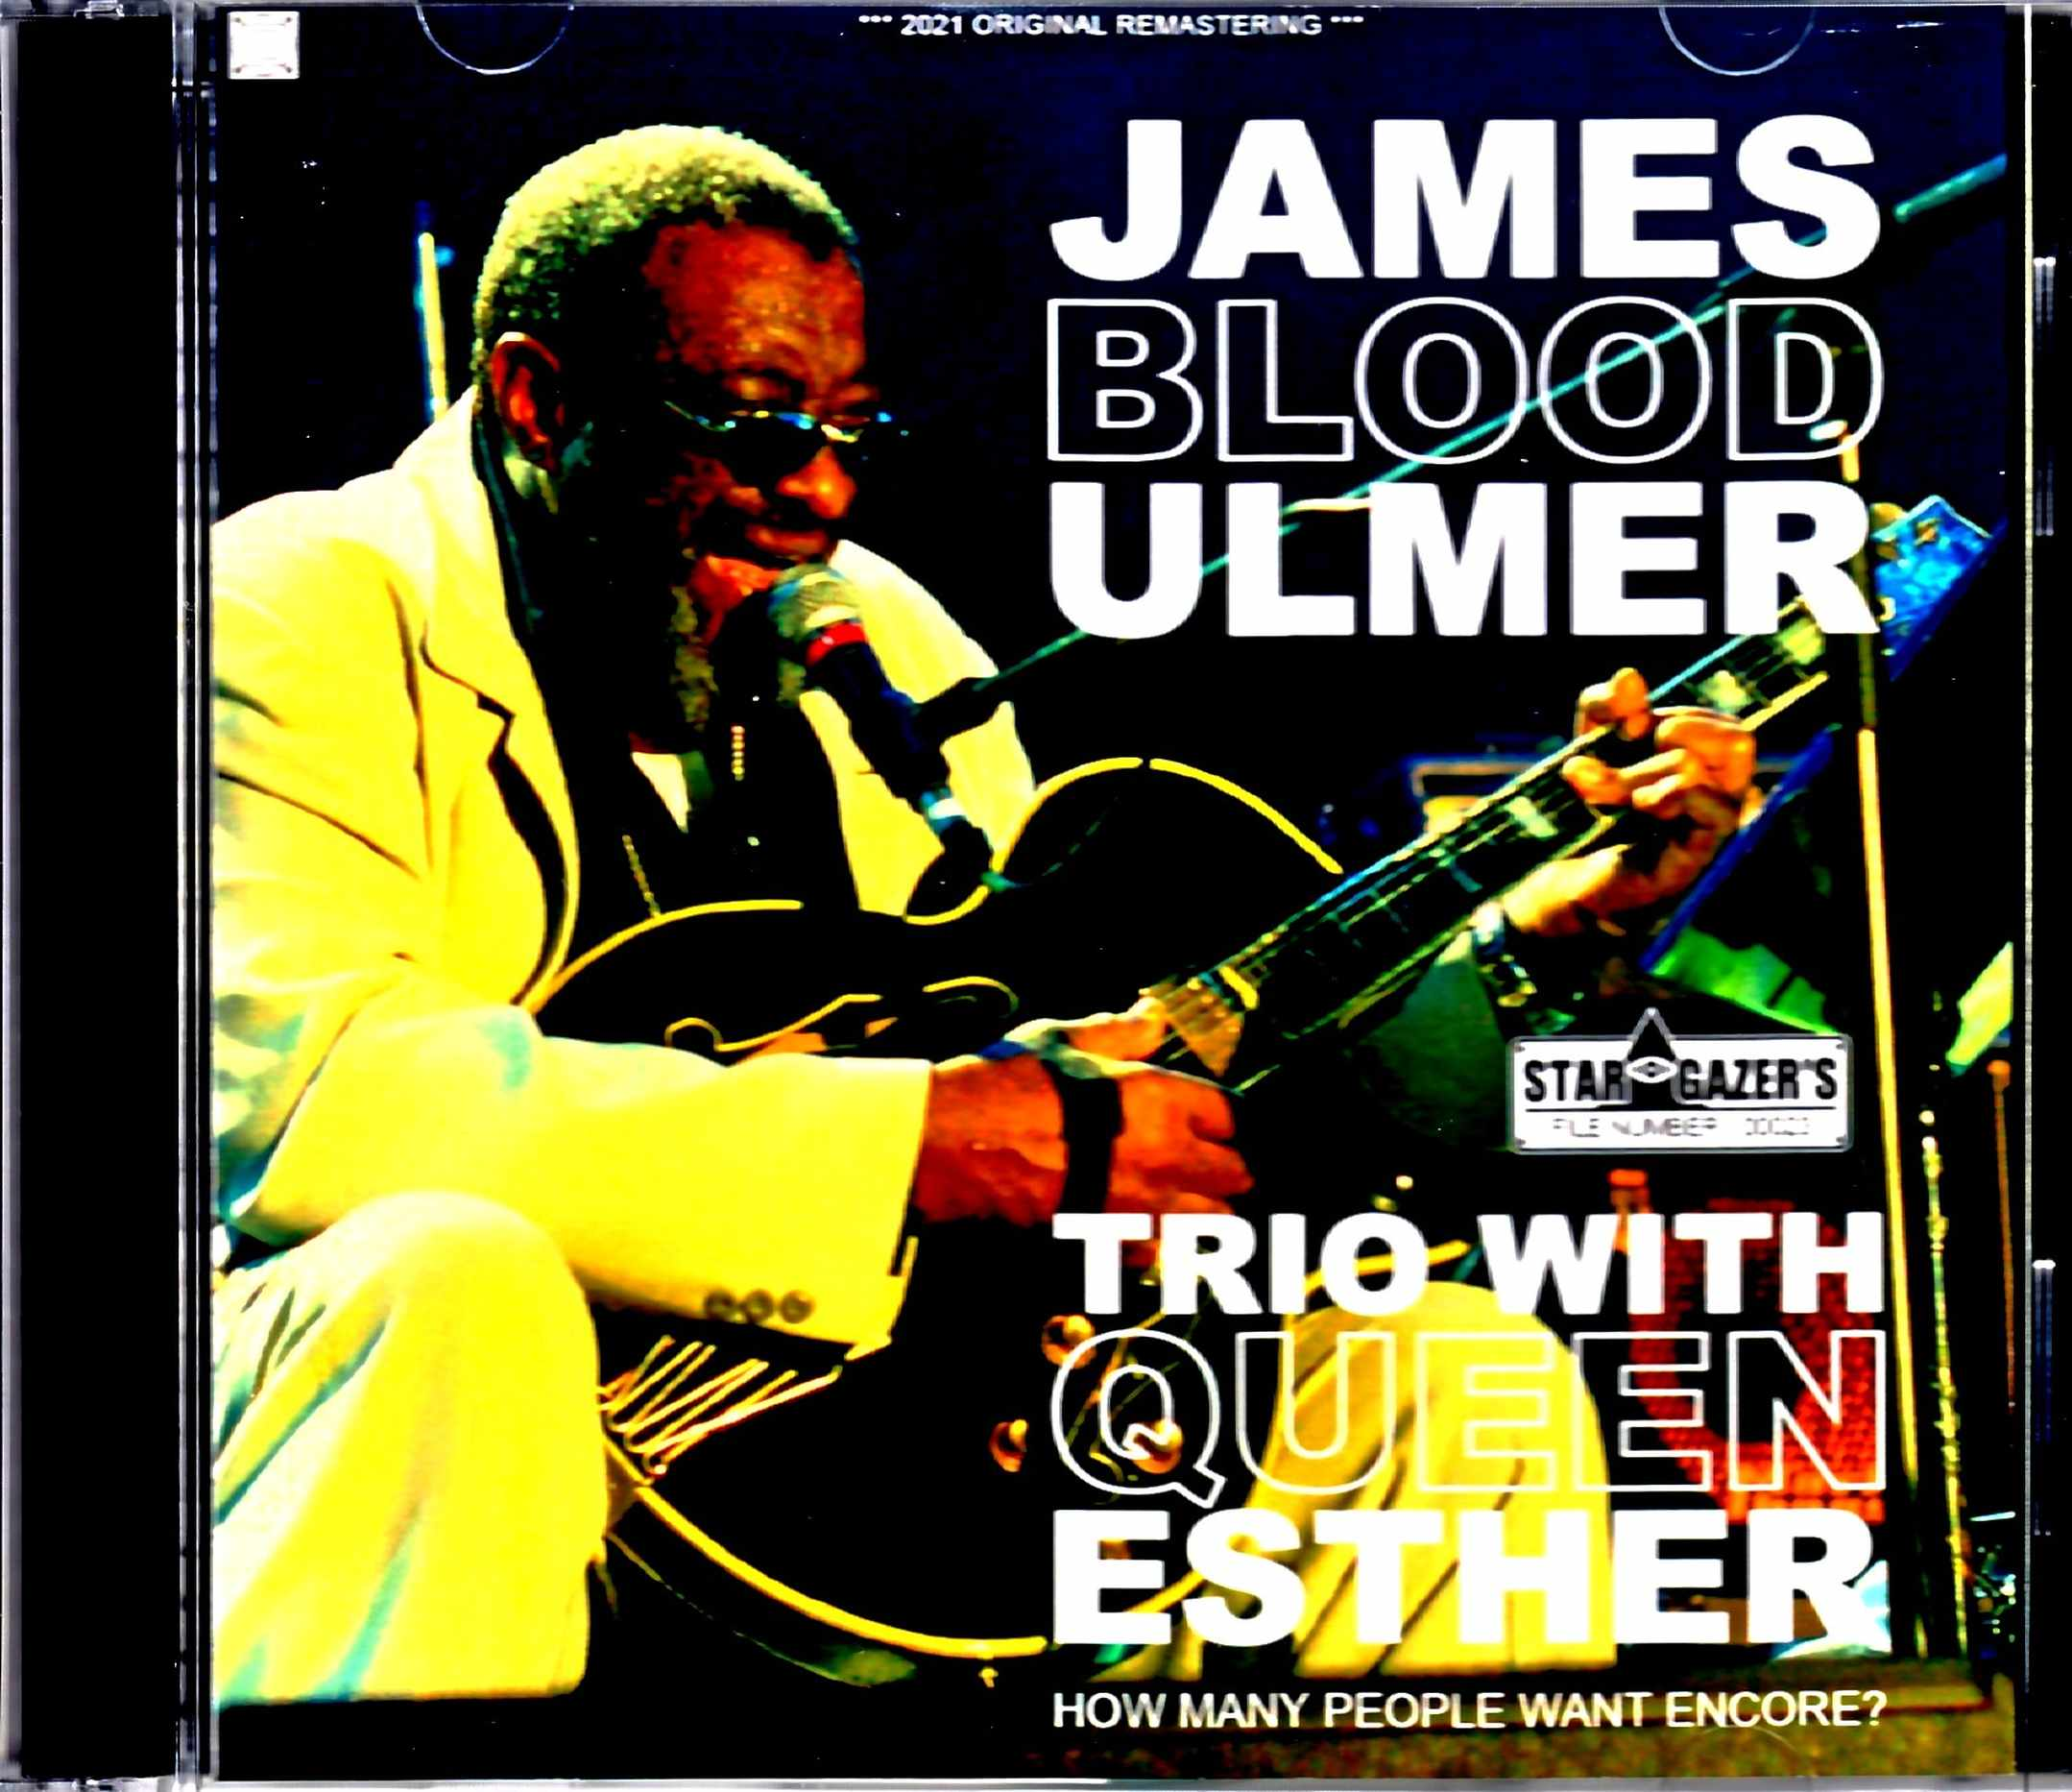 James Blood Ulmer ジェームス・ブラッド・ウルマー/Germany 2012